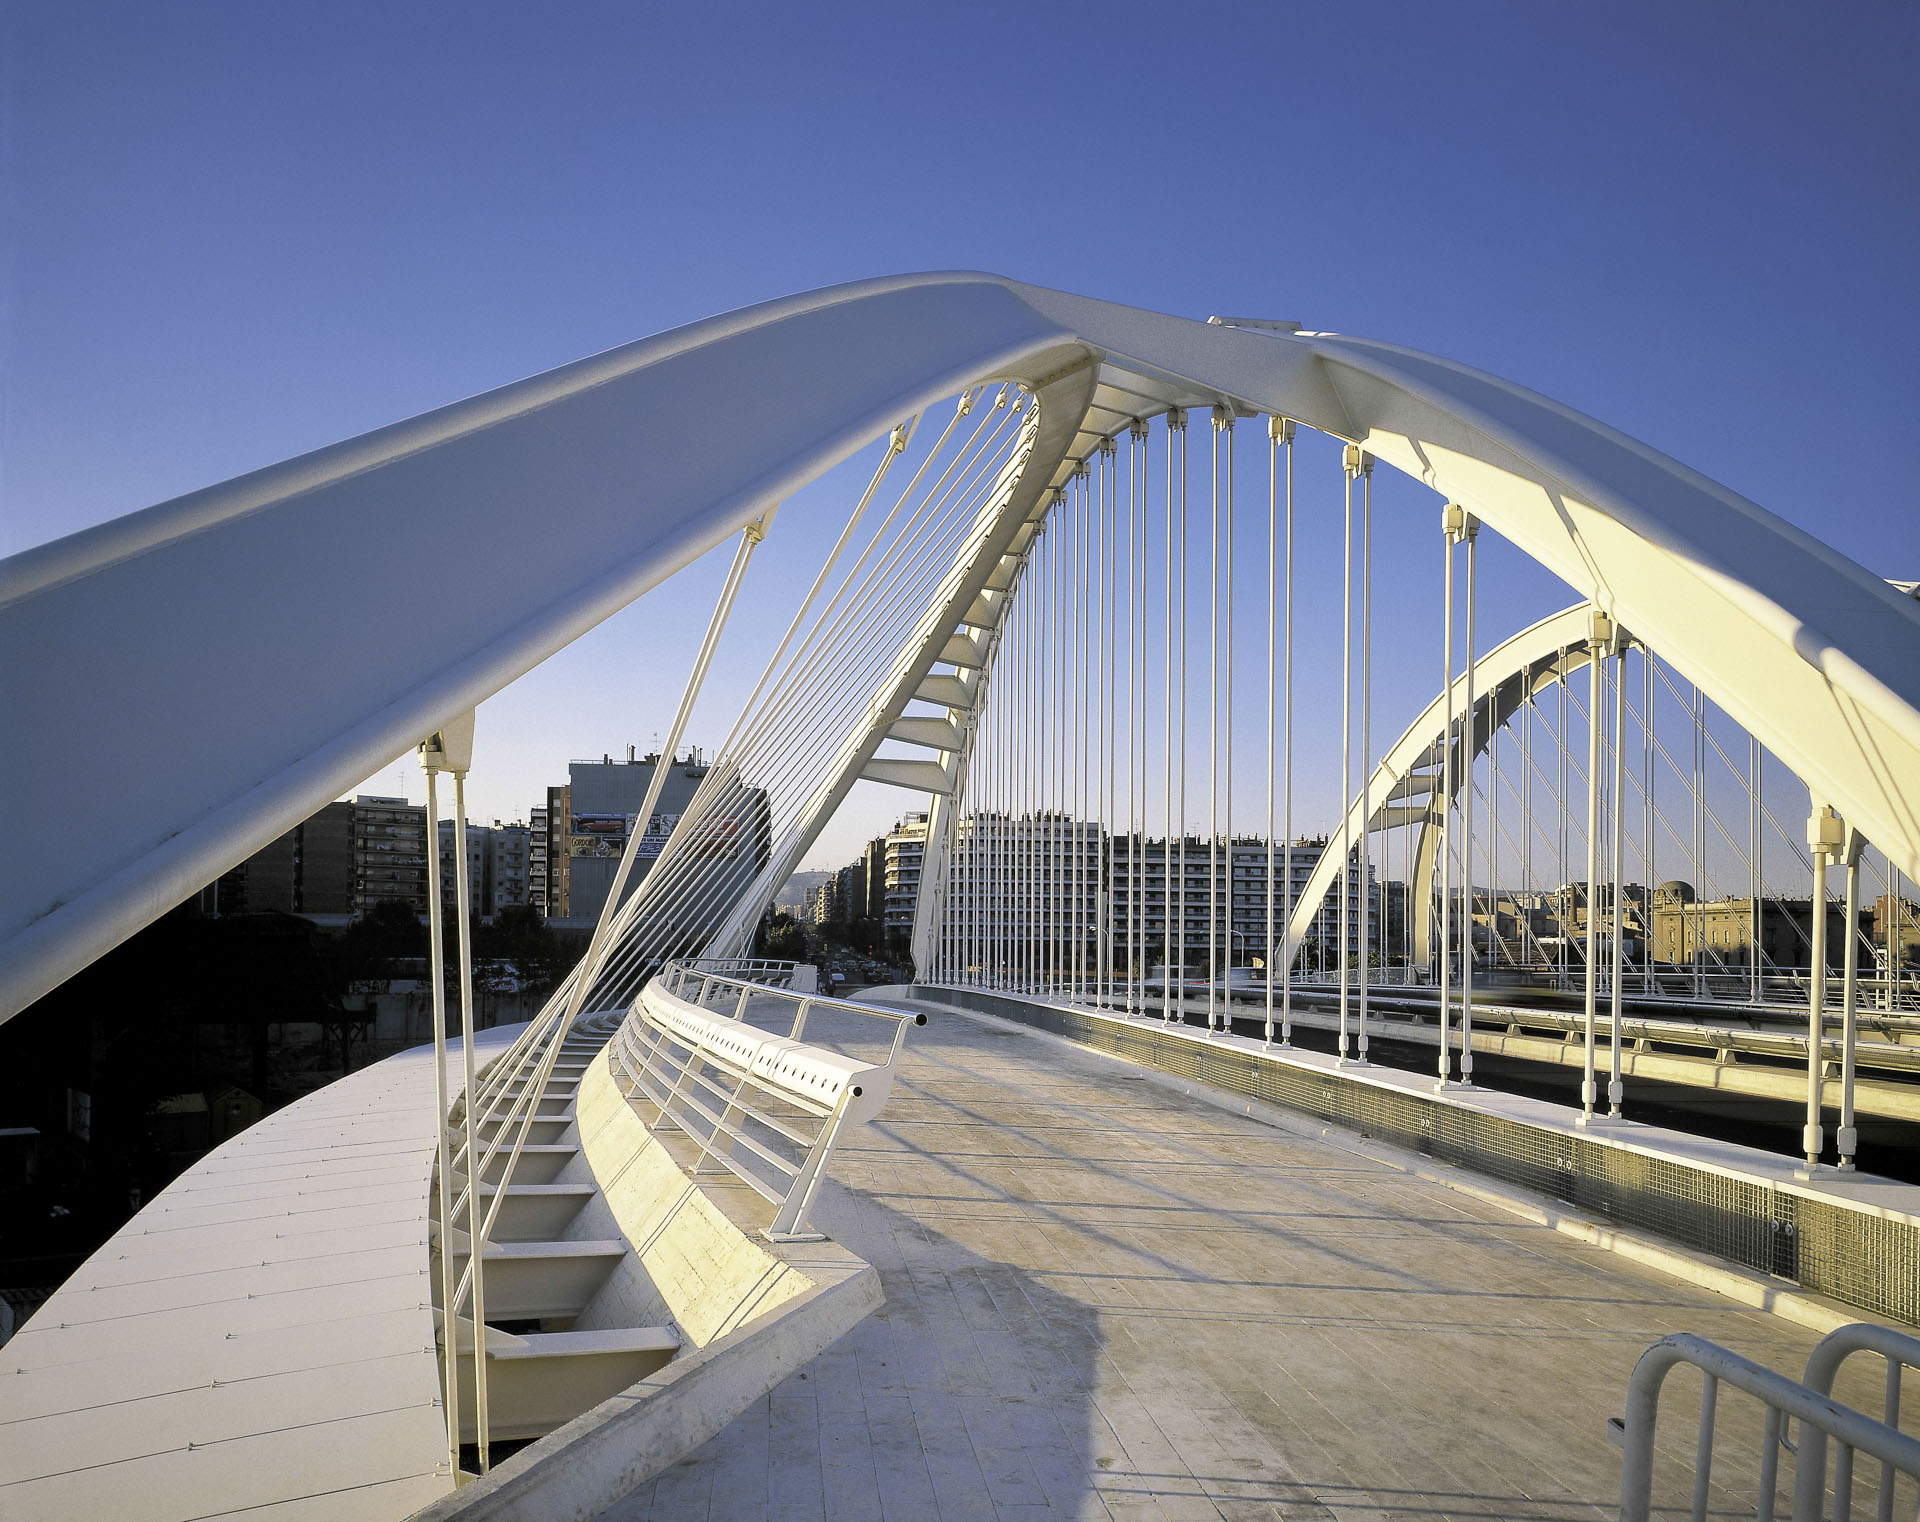 Santiago calatrava wins 2015 european prize for for Gimnasio bac de roda